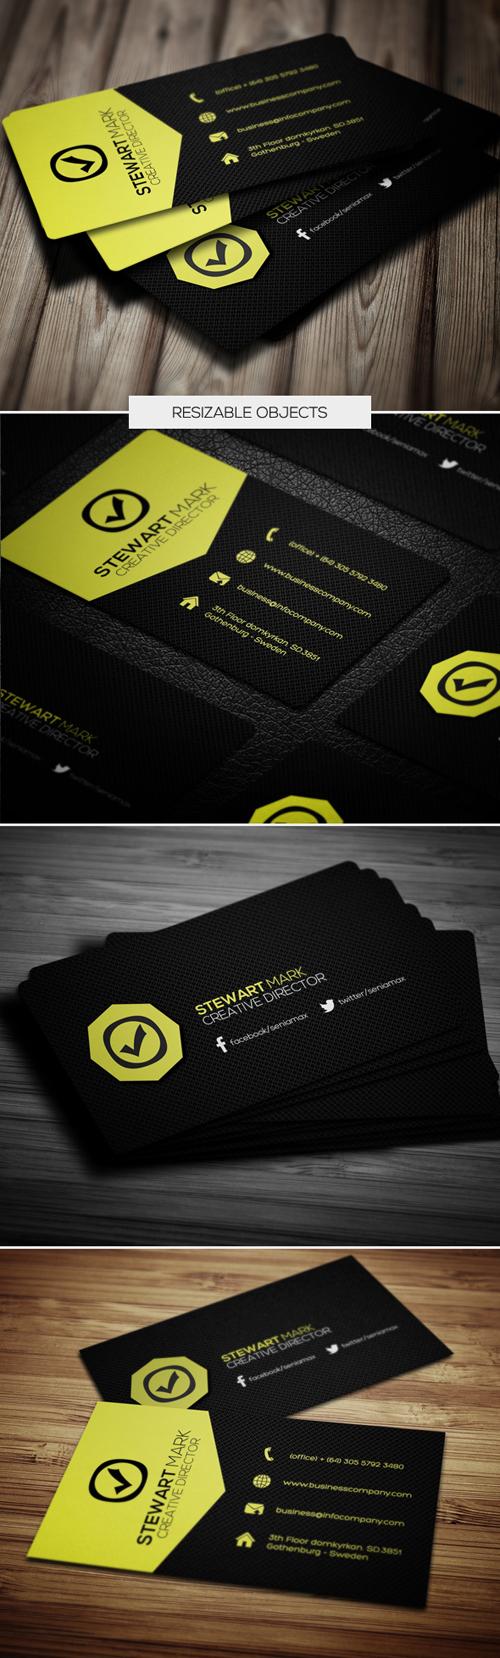 business cards template design - 7